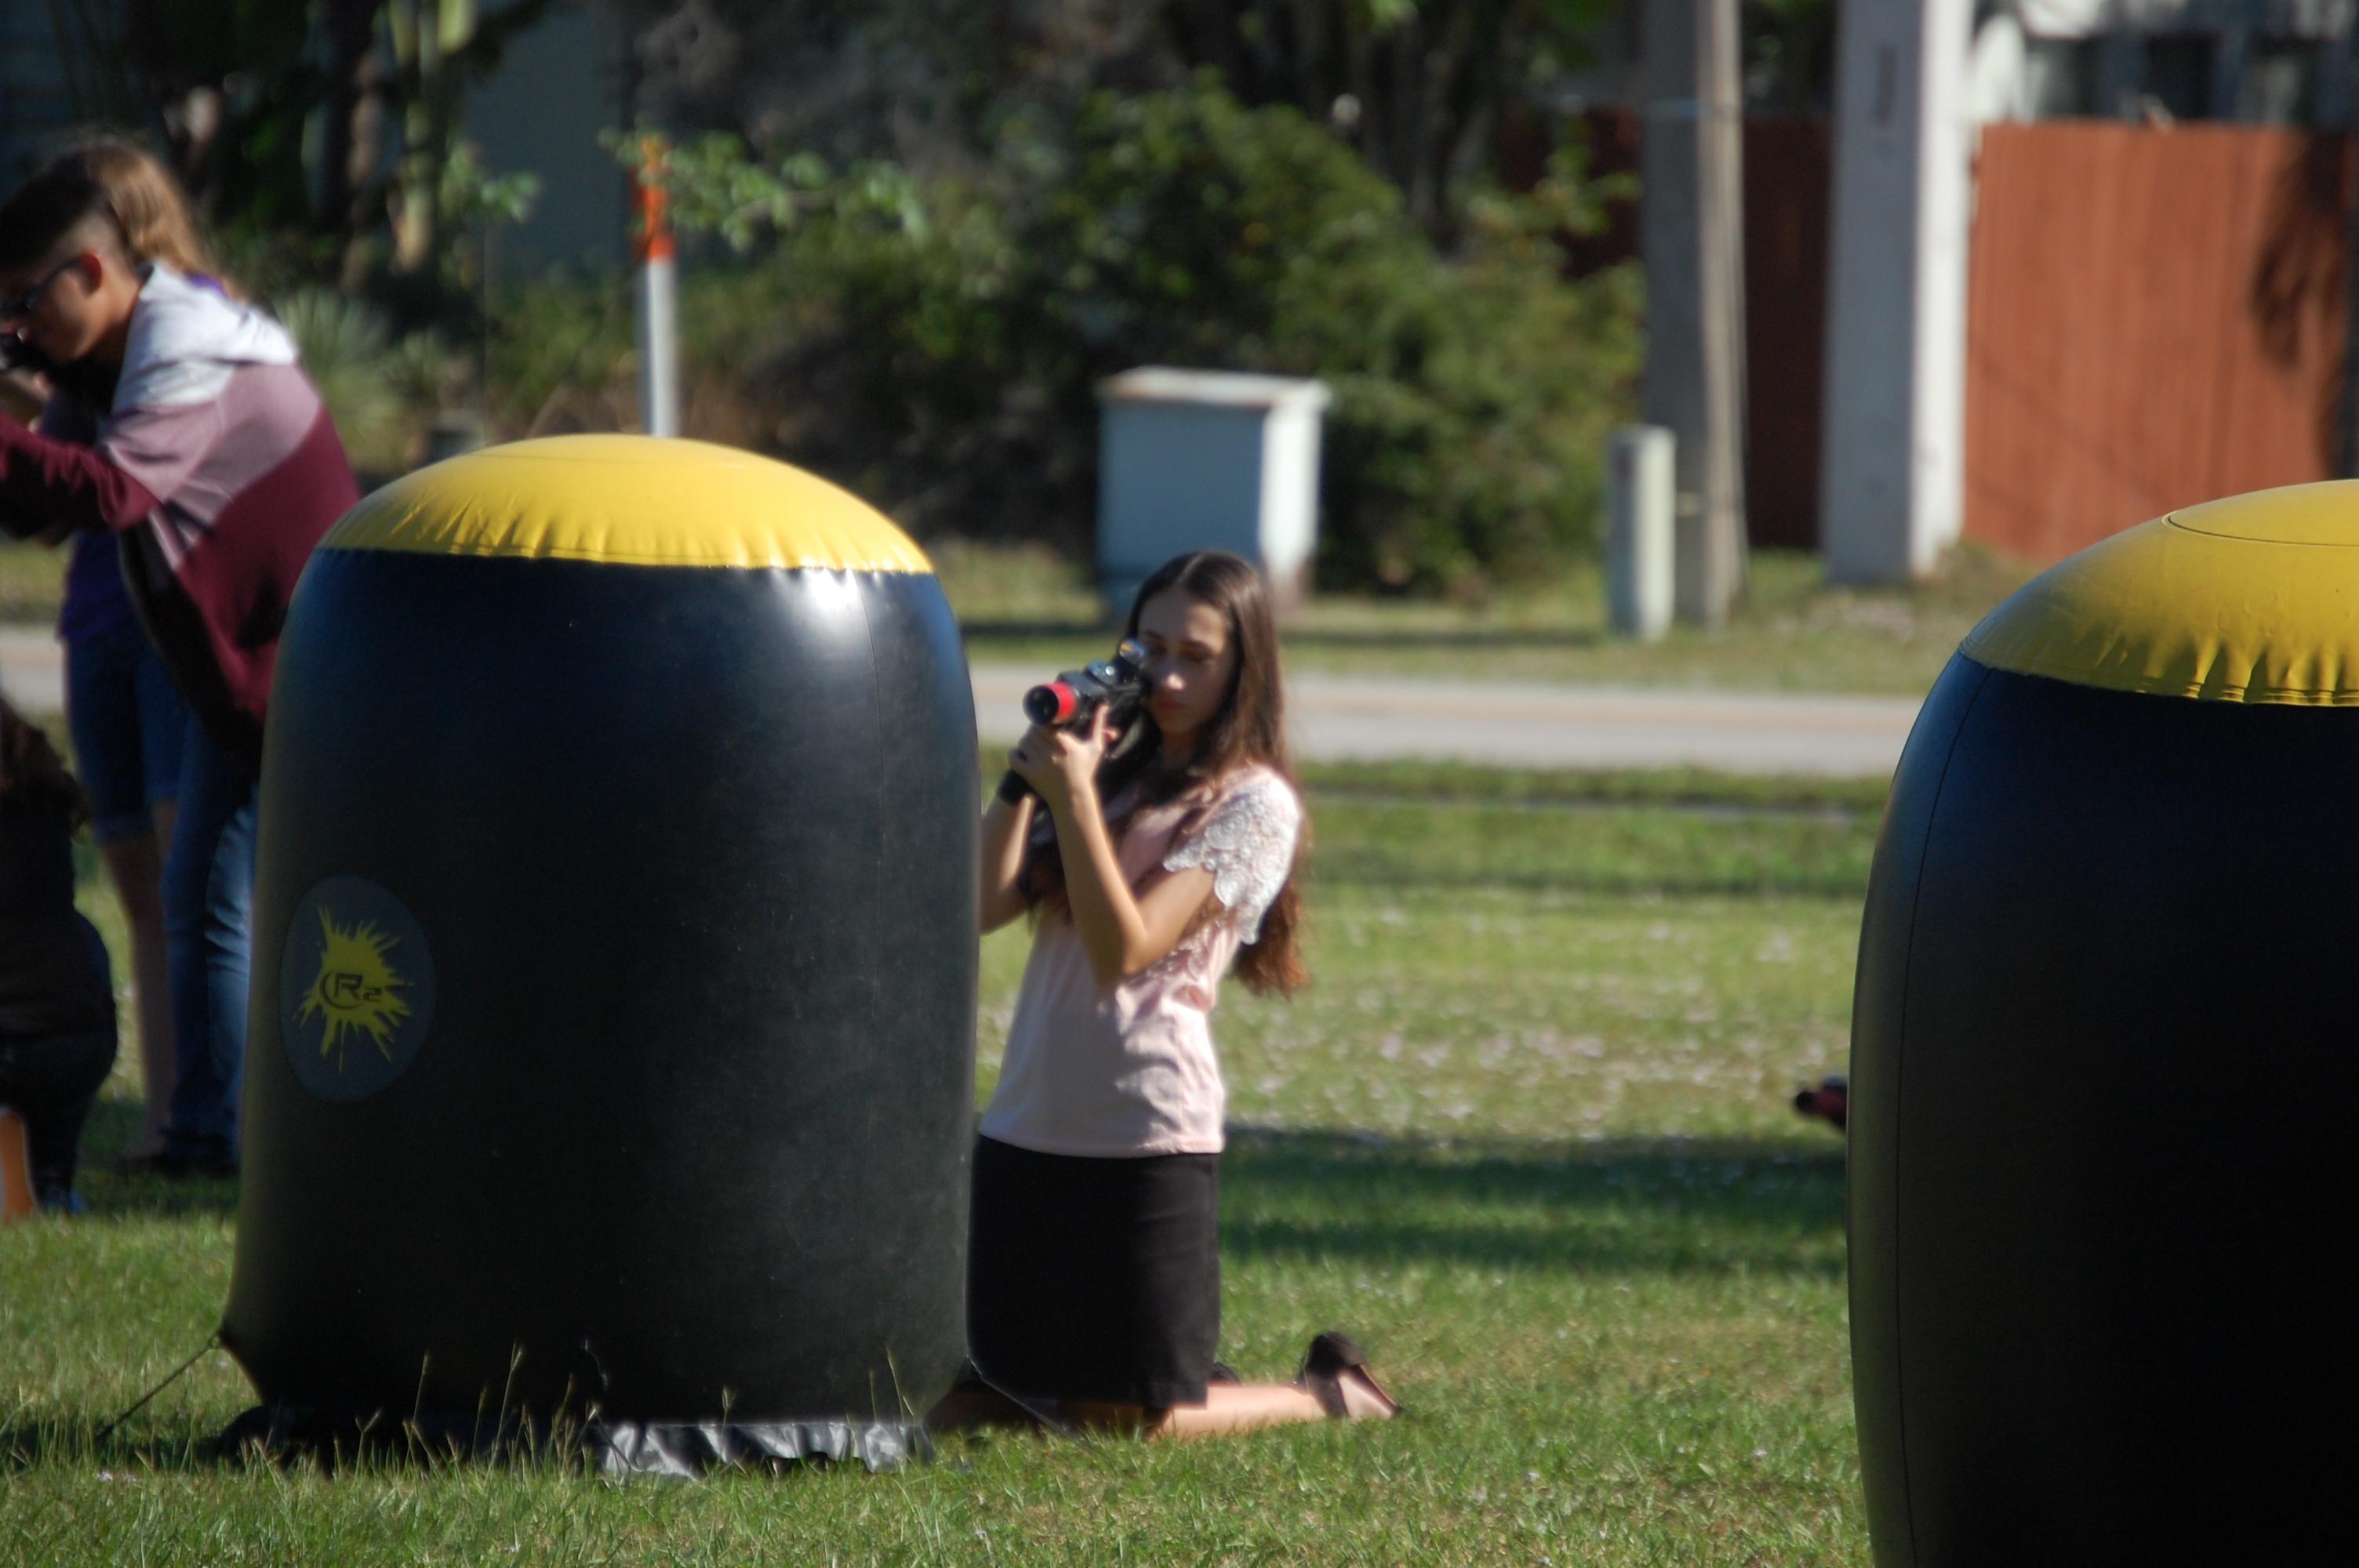 Mobile Laser Tag in Ft. Myers, FL